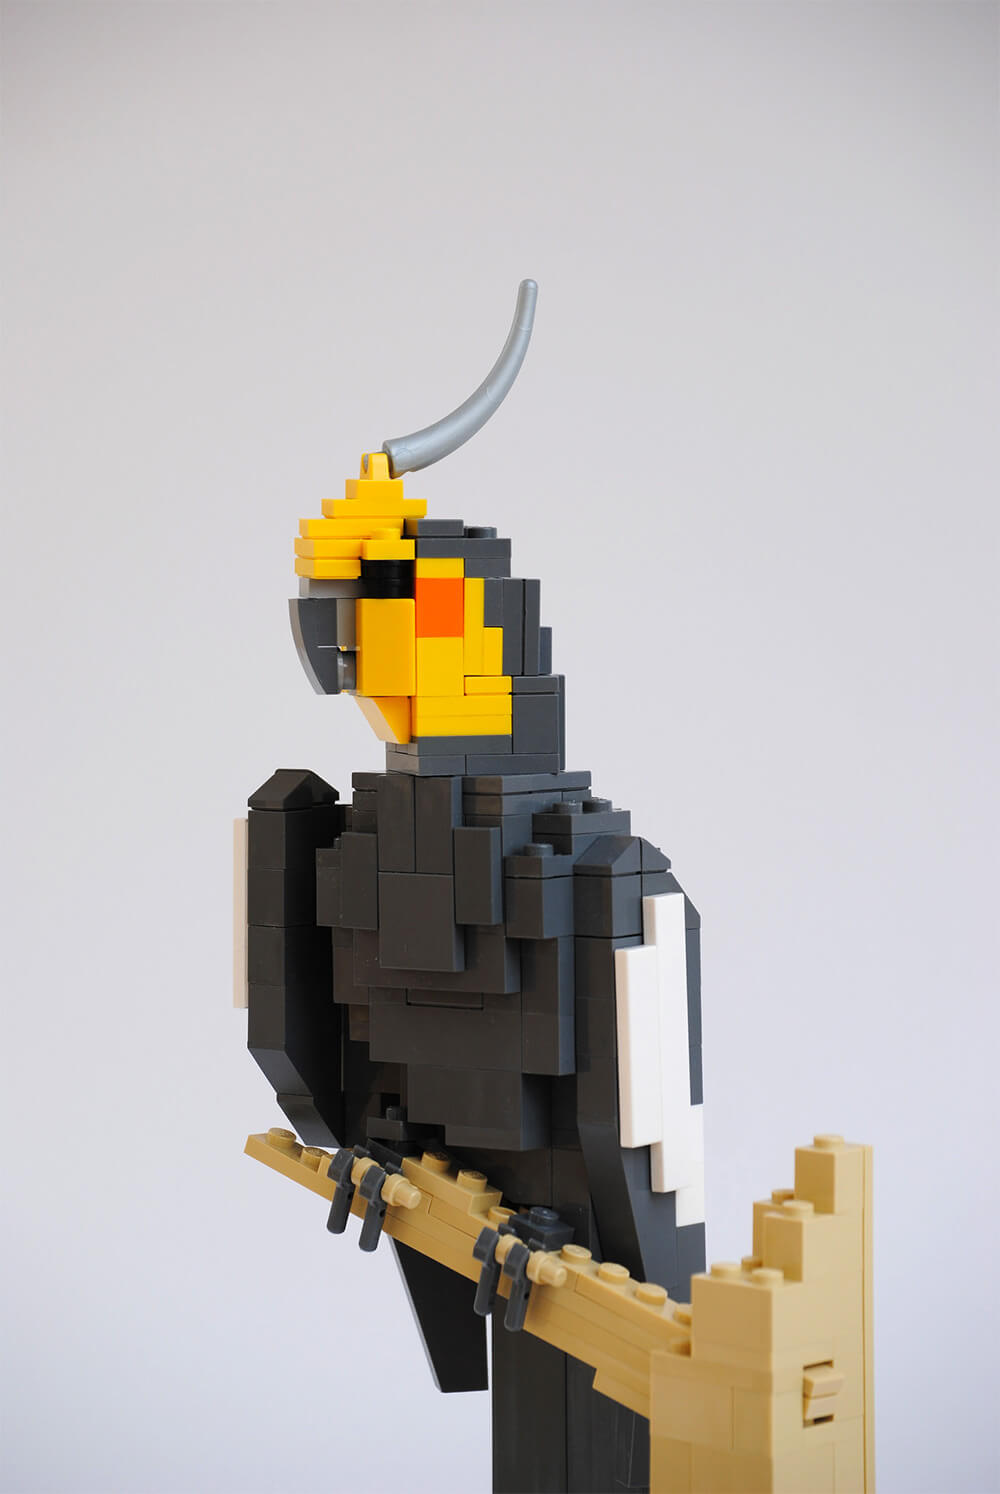 LEGO sculptures 9 (1)